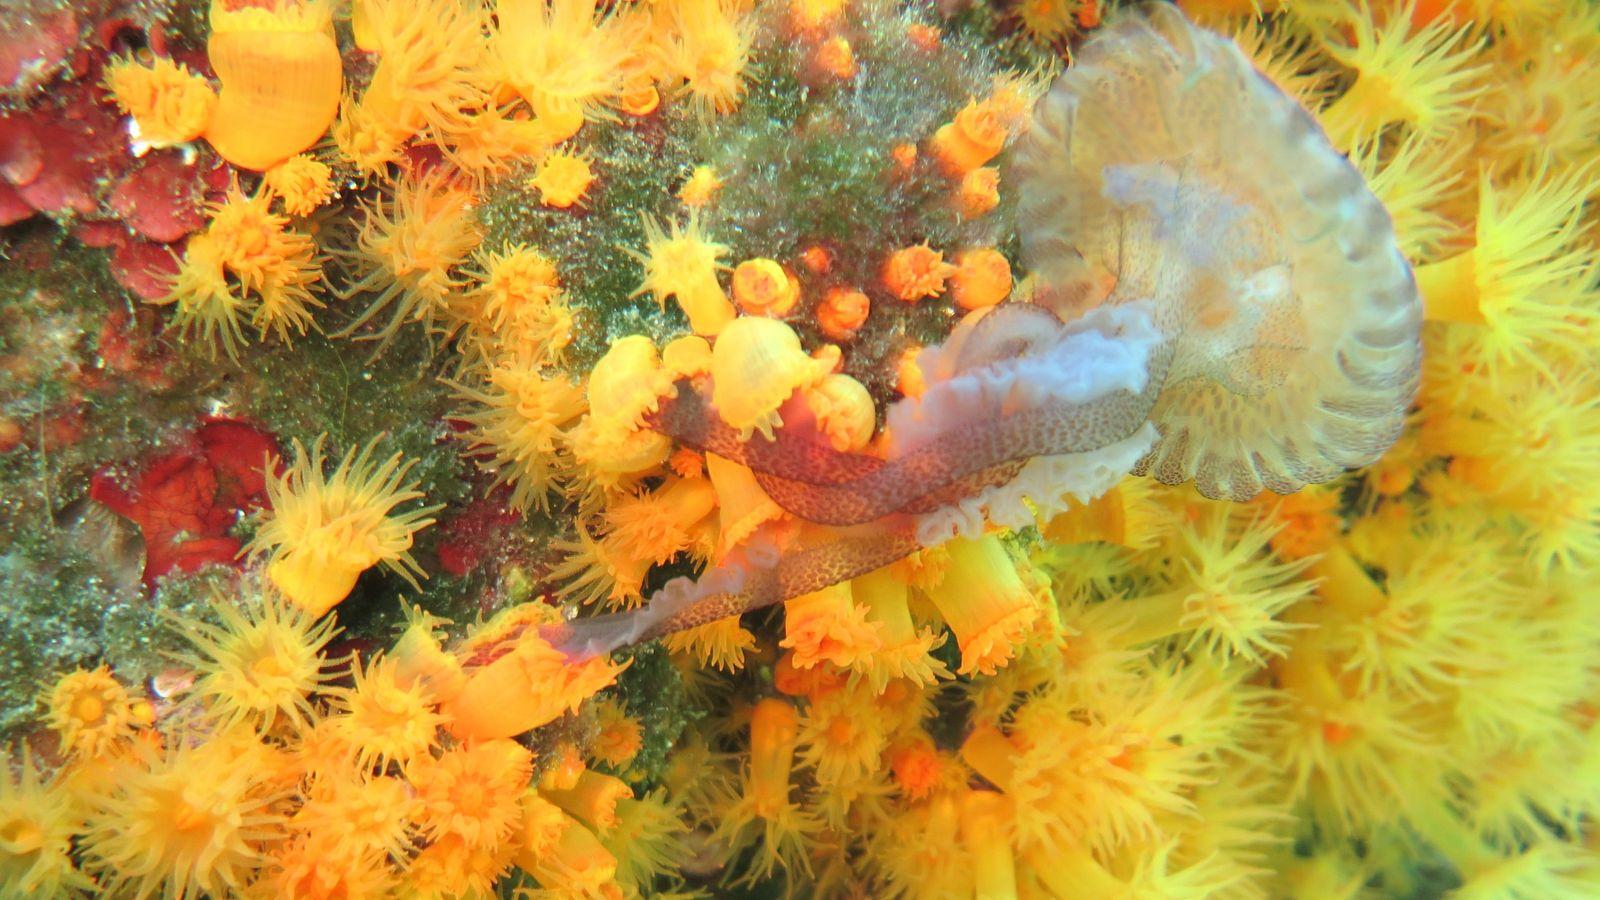 180731_Coral_Eats_Jellyfish_DE~~~~~de~mux~~1.JPG